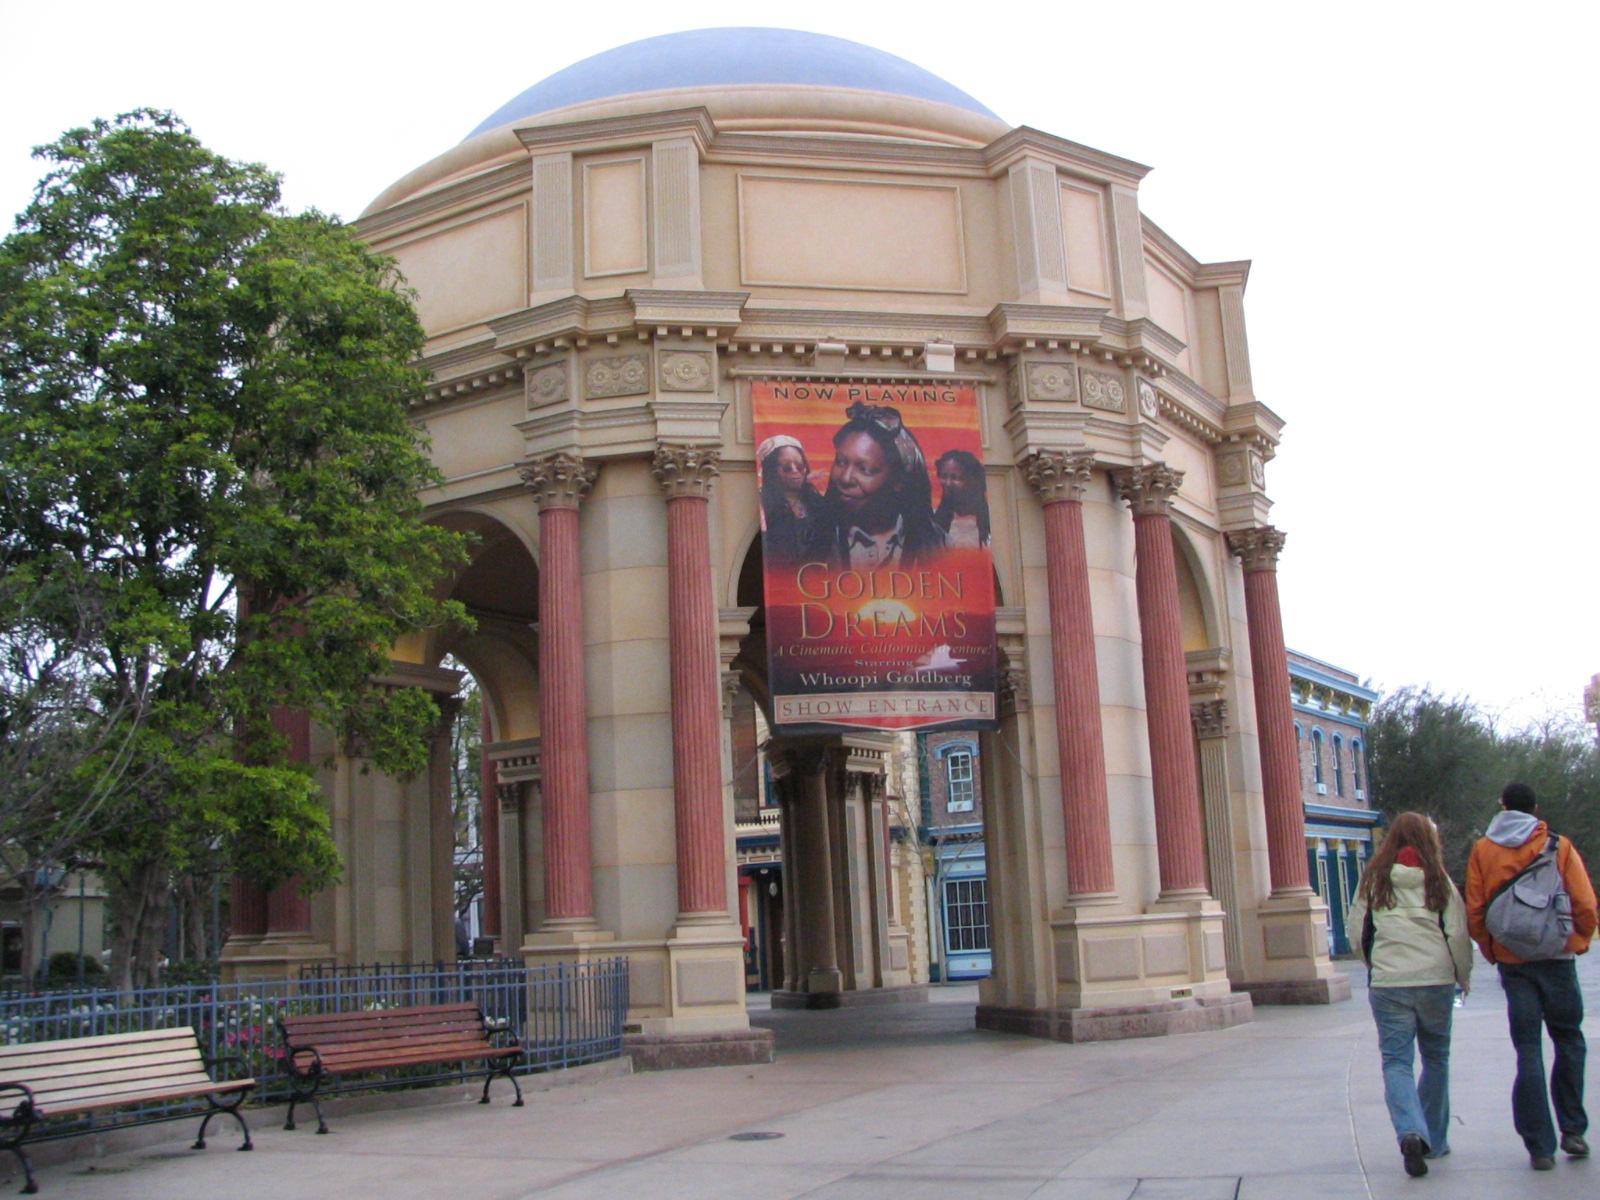 Palace of Fine Arts rotunda - Disneyland Part 5